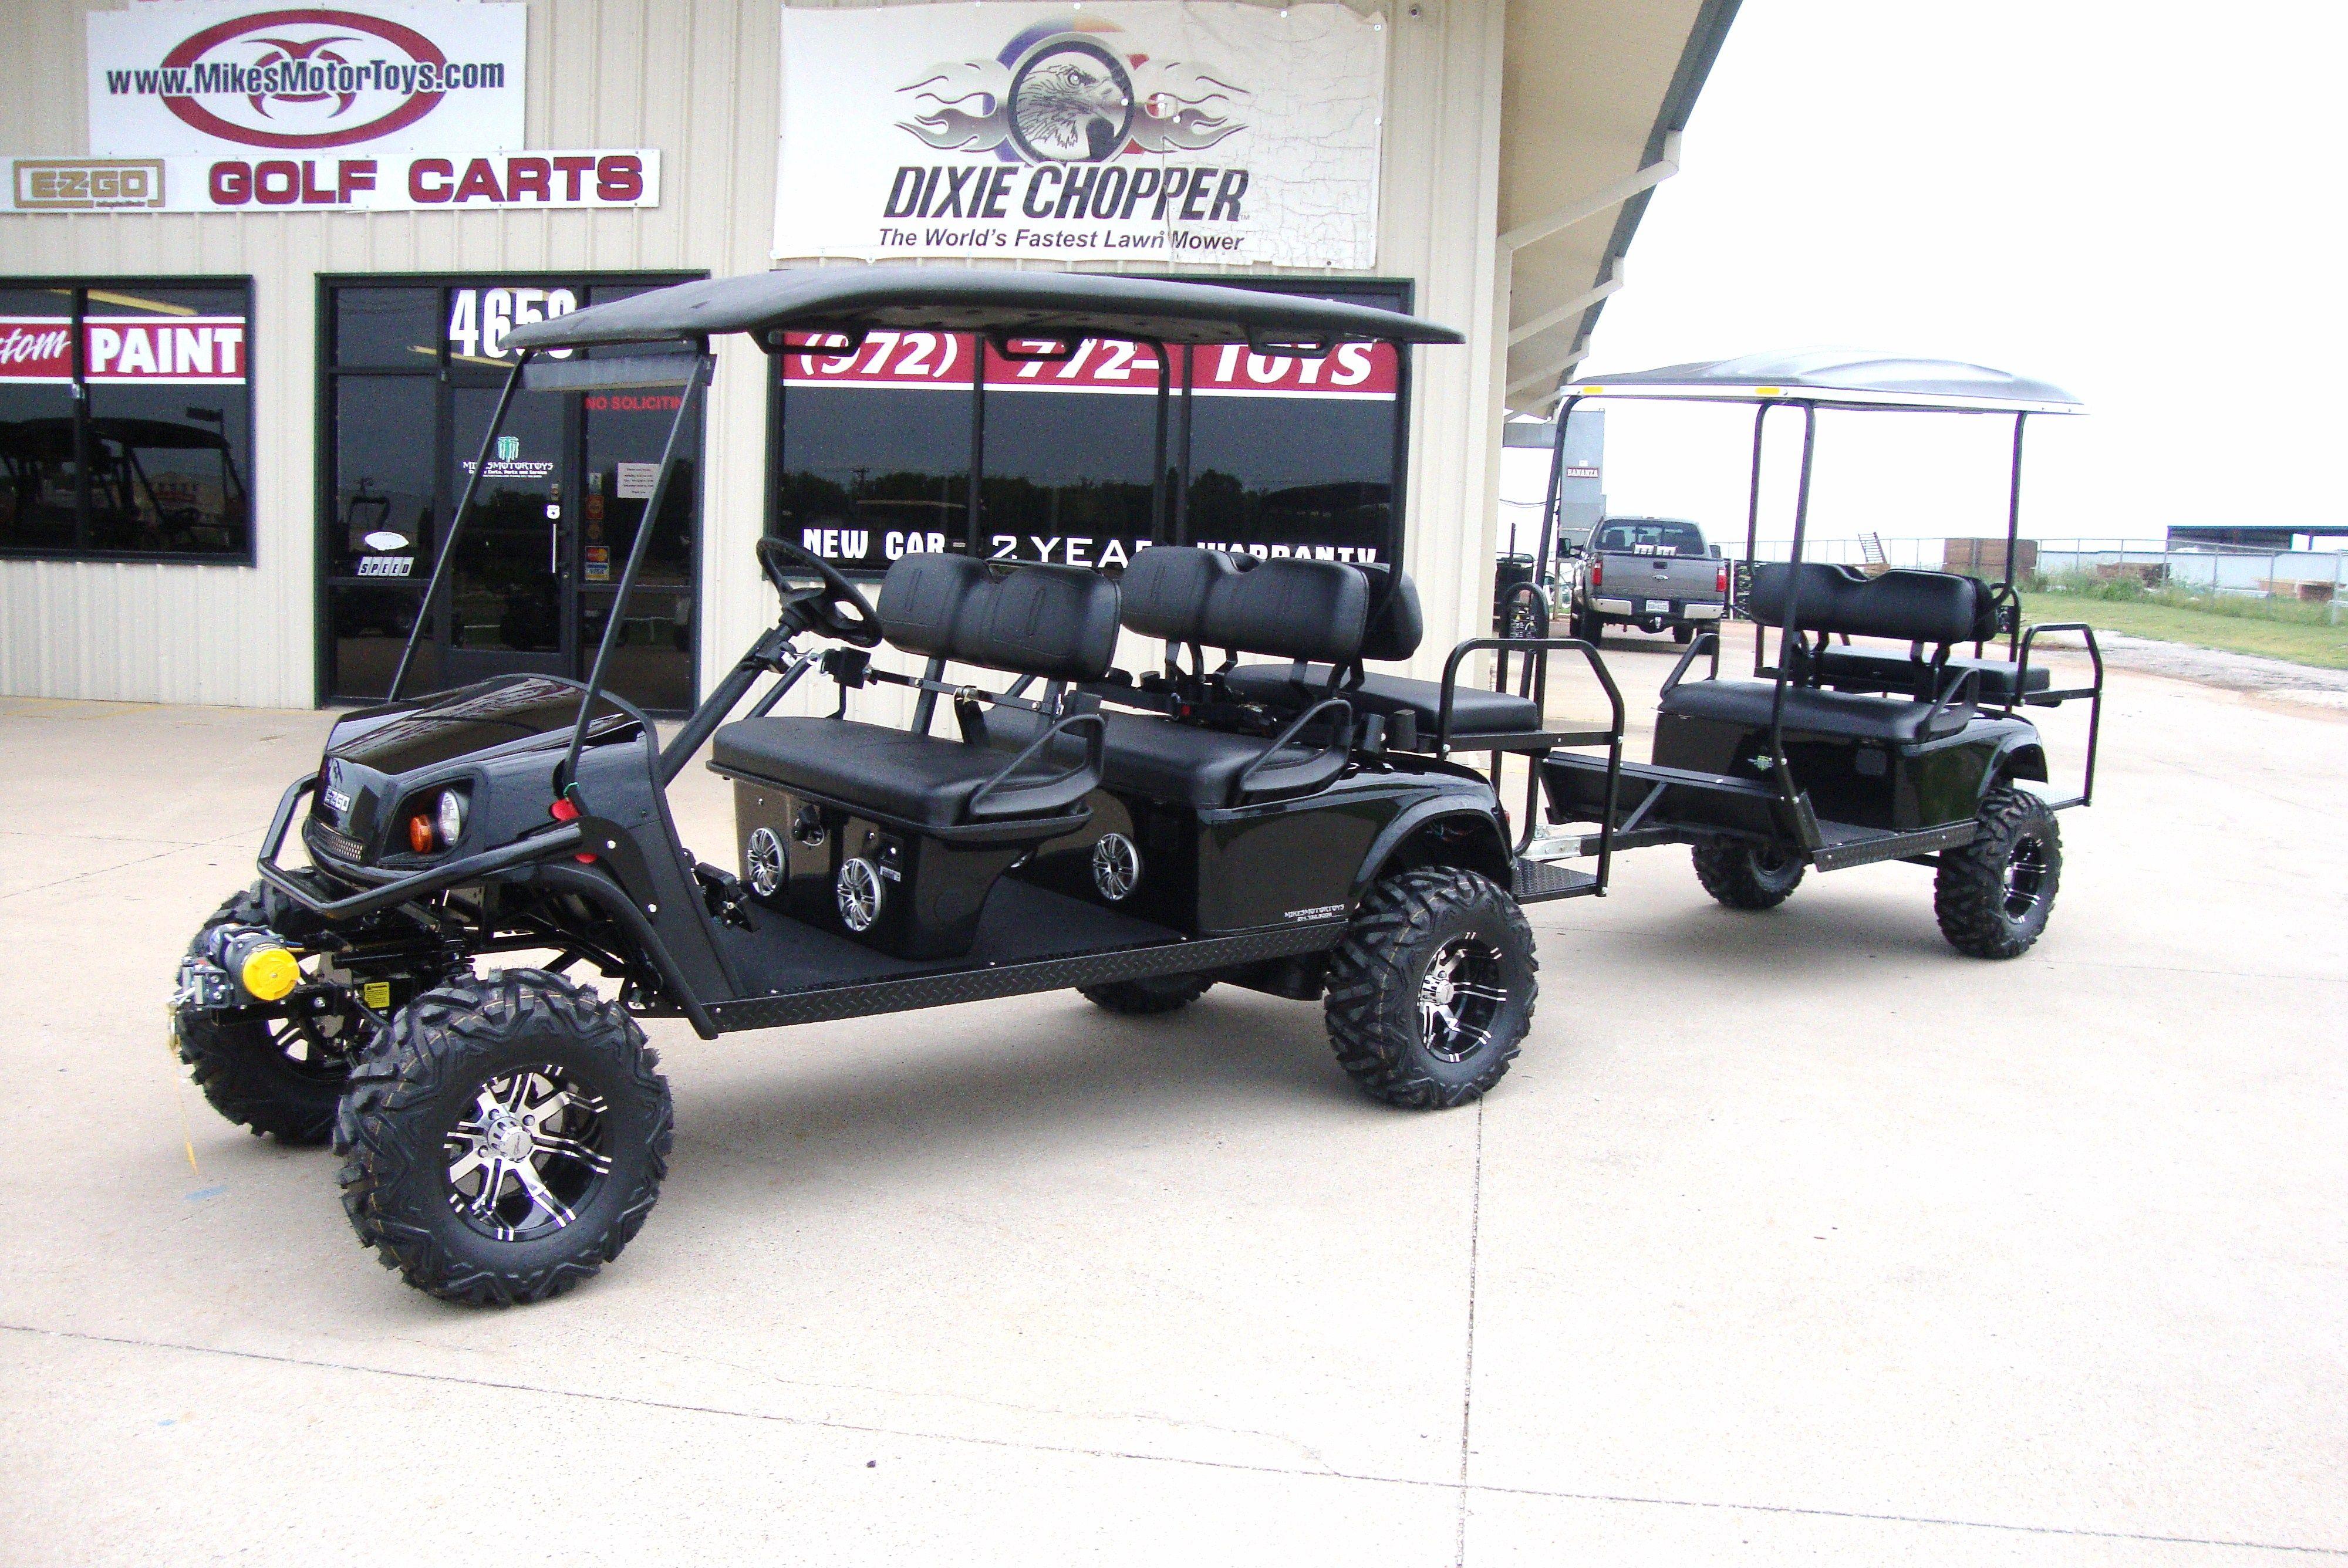 6 Passenger With A Trailer Golf Carts For Sale Golf Carts Club Car Golf Cart